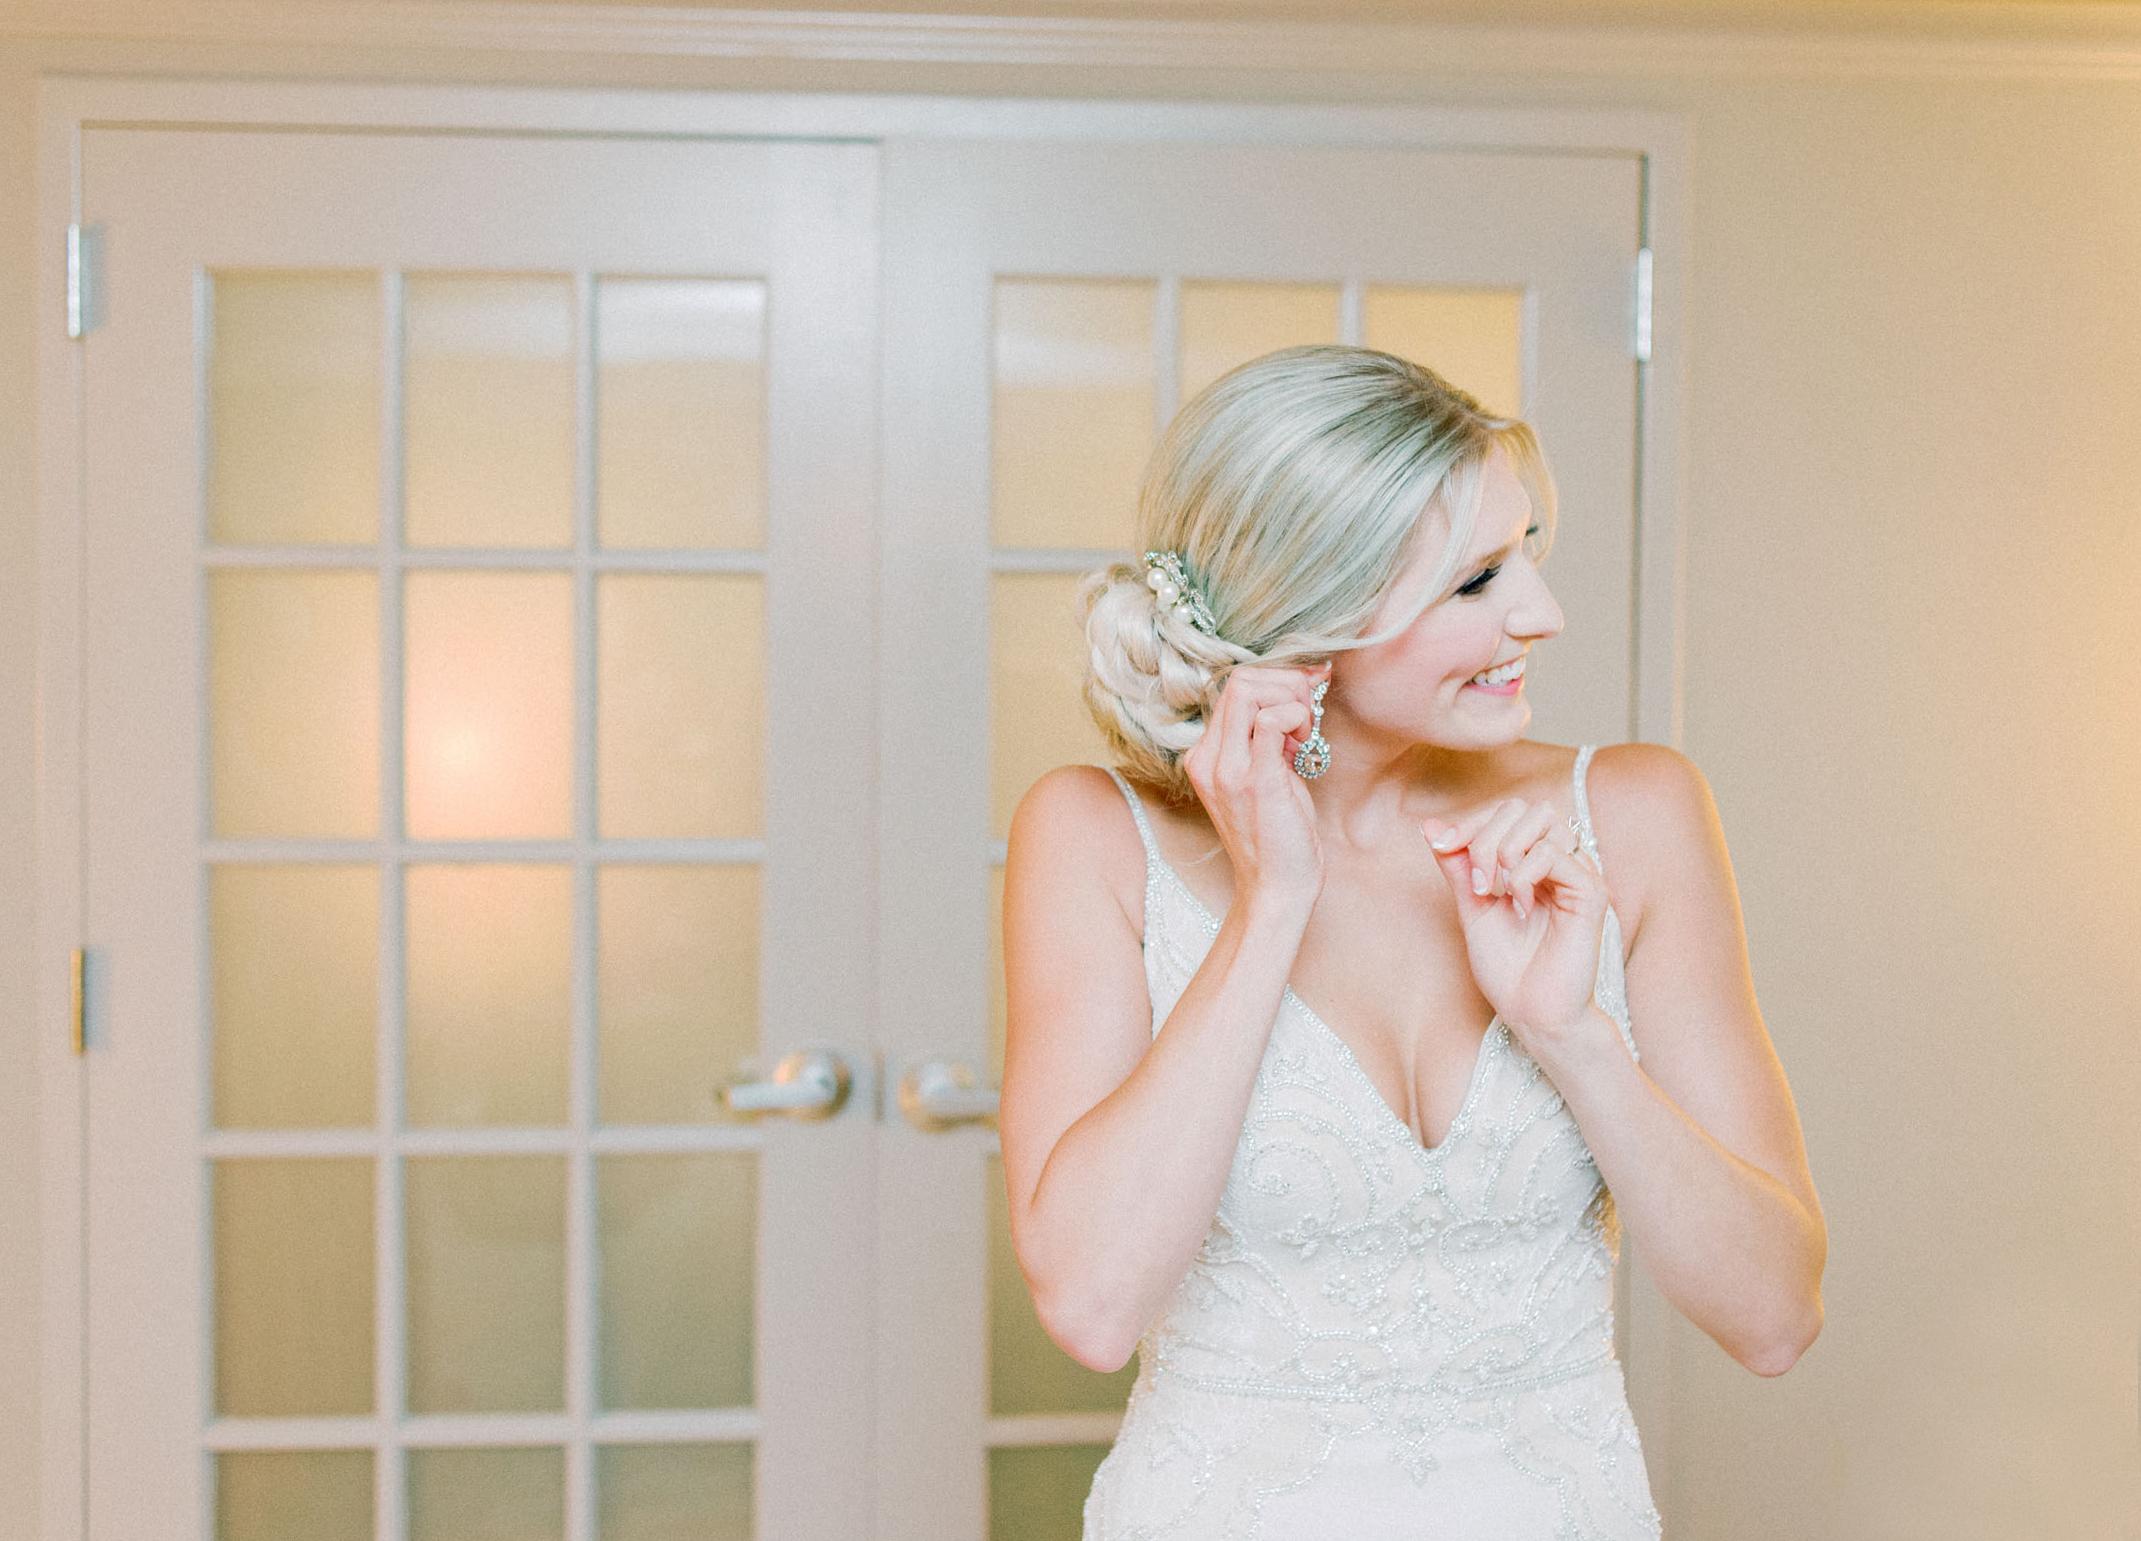 Minneapolis Radison Blue Hotel Wedding Getting Ready